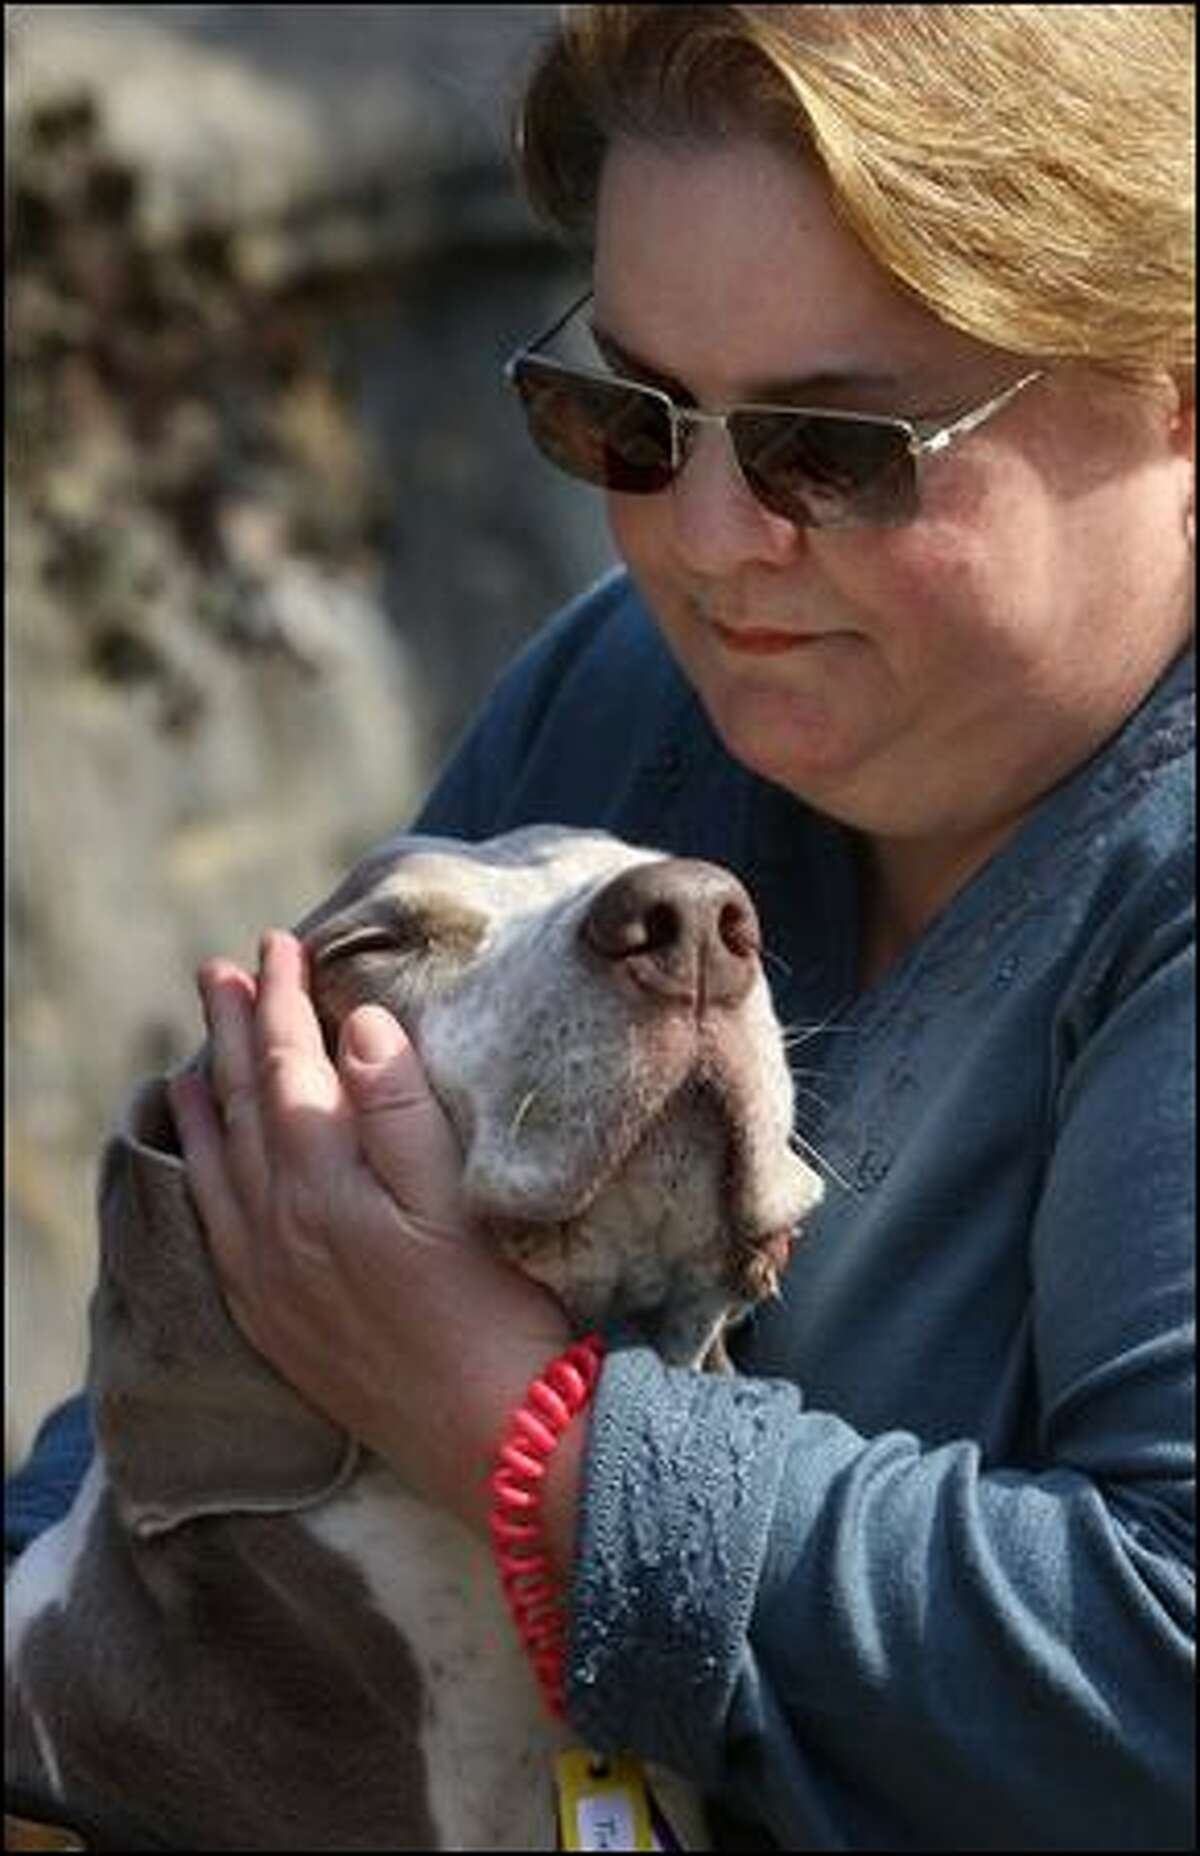 Kathy McAvoy-Rogalski hugs Gunner, a Weimaraner she cares for through her Fetch pet sitting franchise.